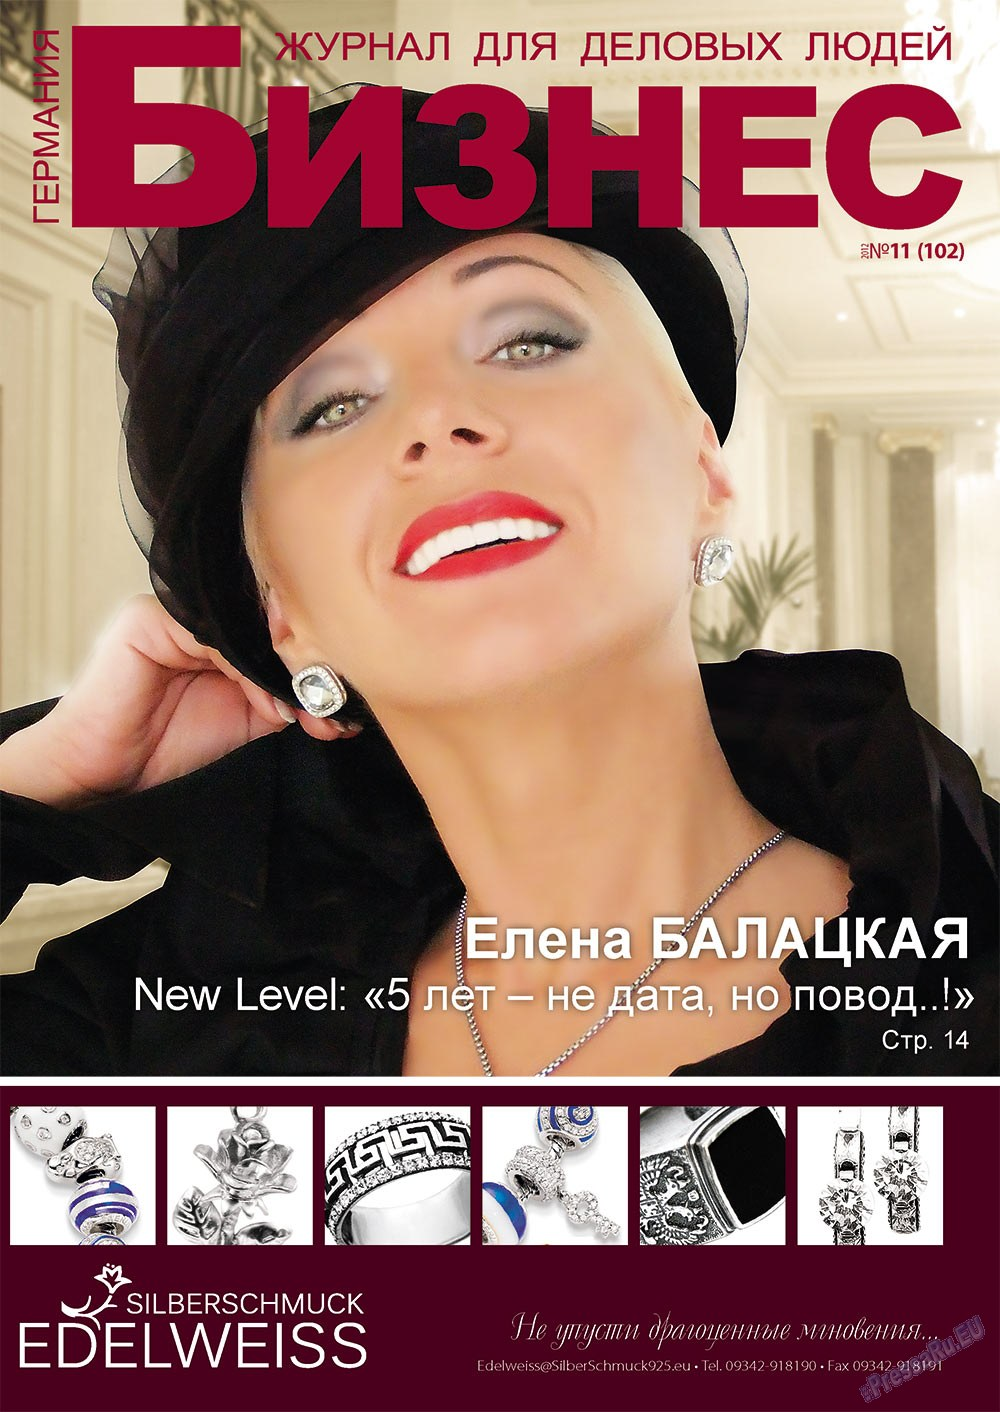 Бизнес (журнал). 2012 год, номер 11, стр. 1